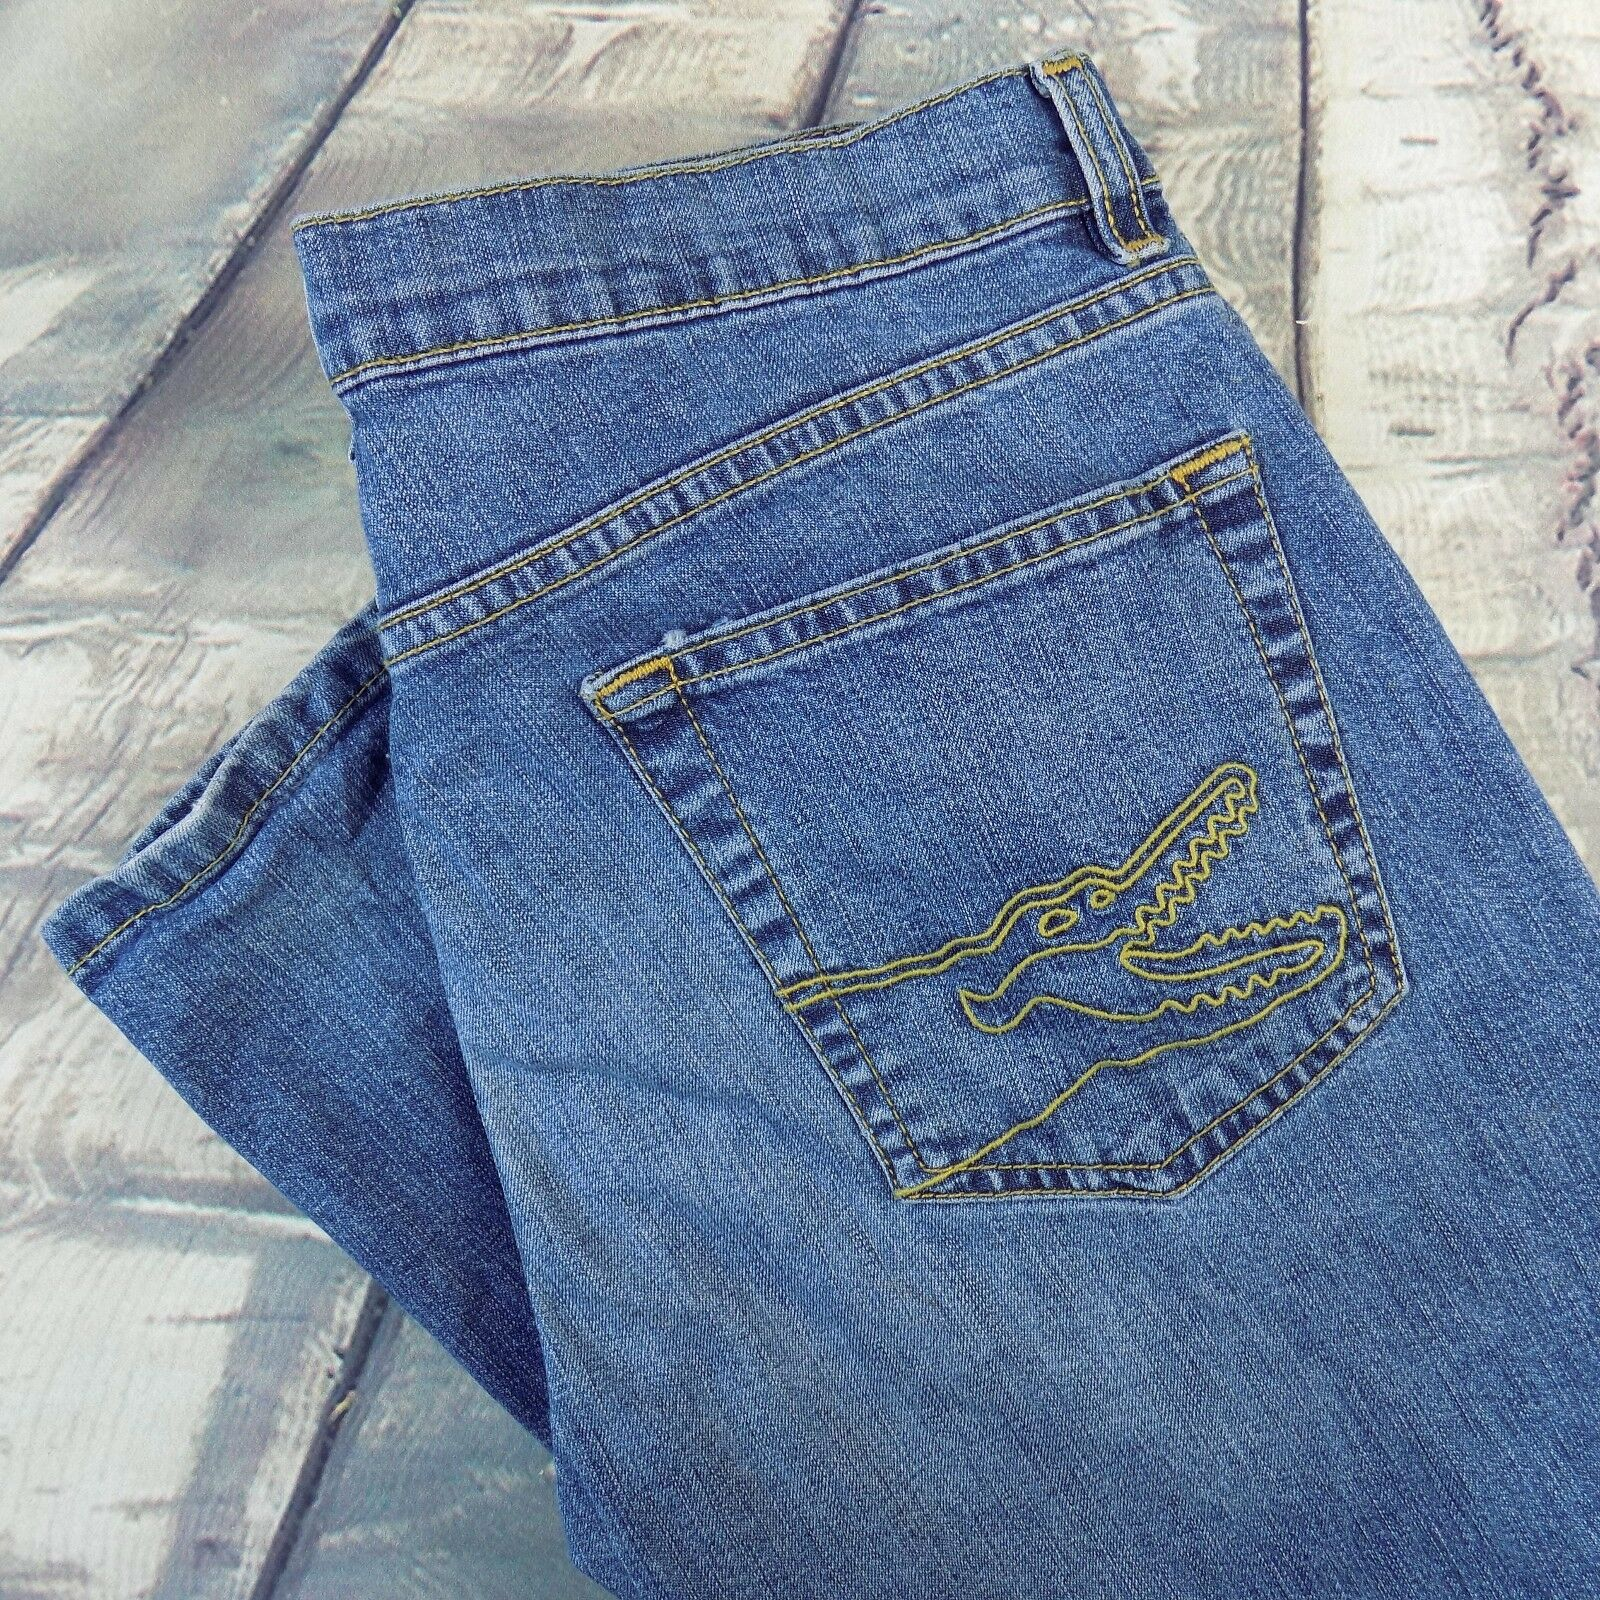 Lacoste Jeans Bootcut Size 30 L Women's Sz 30 33